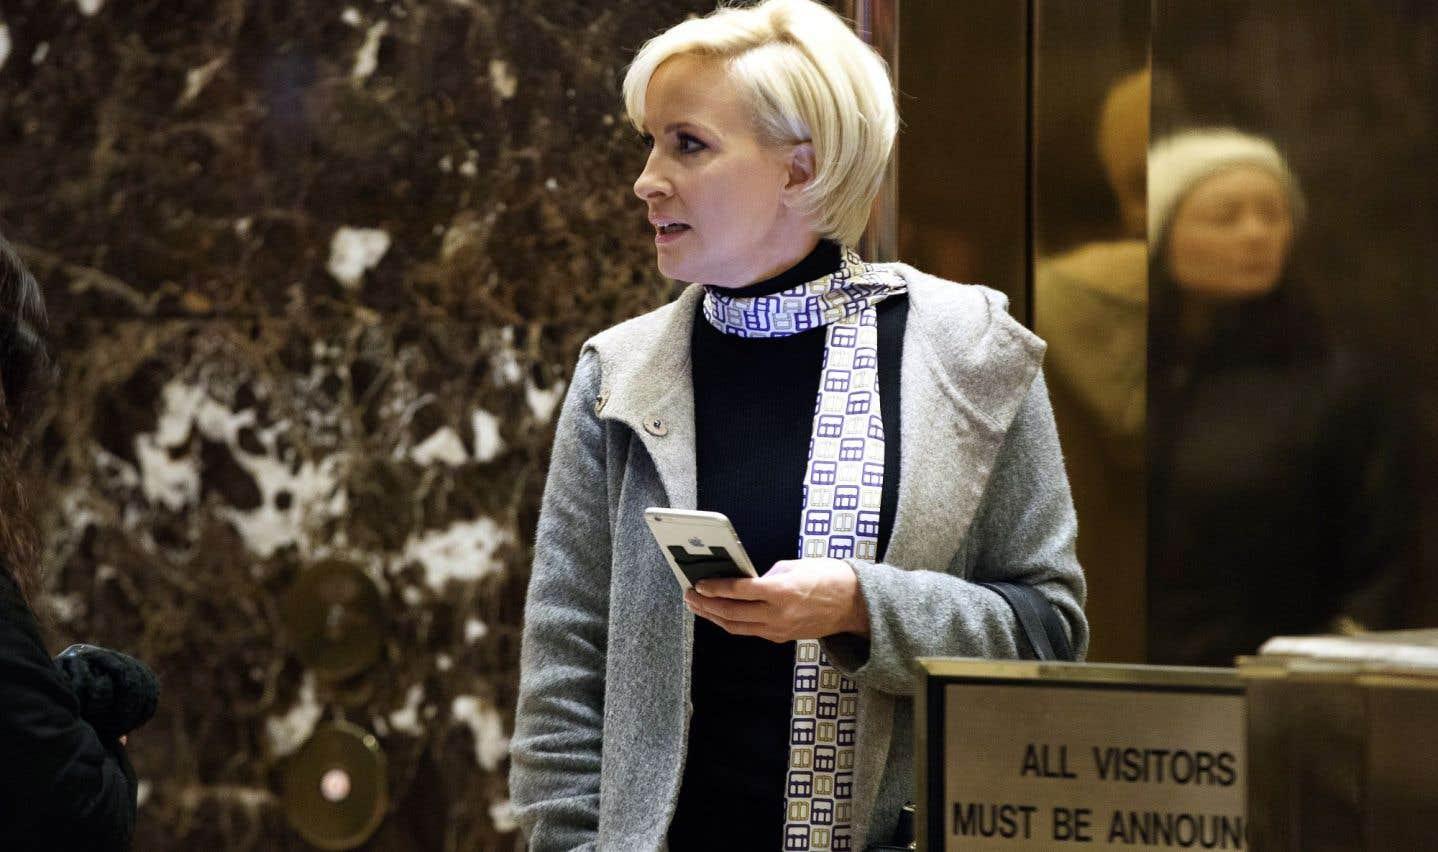 Trump fait scandale en injuriant une journaliste